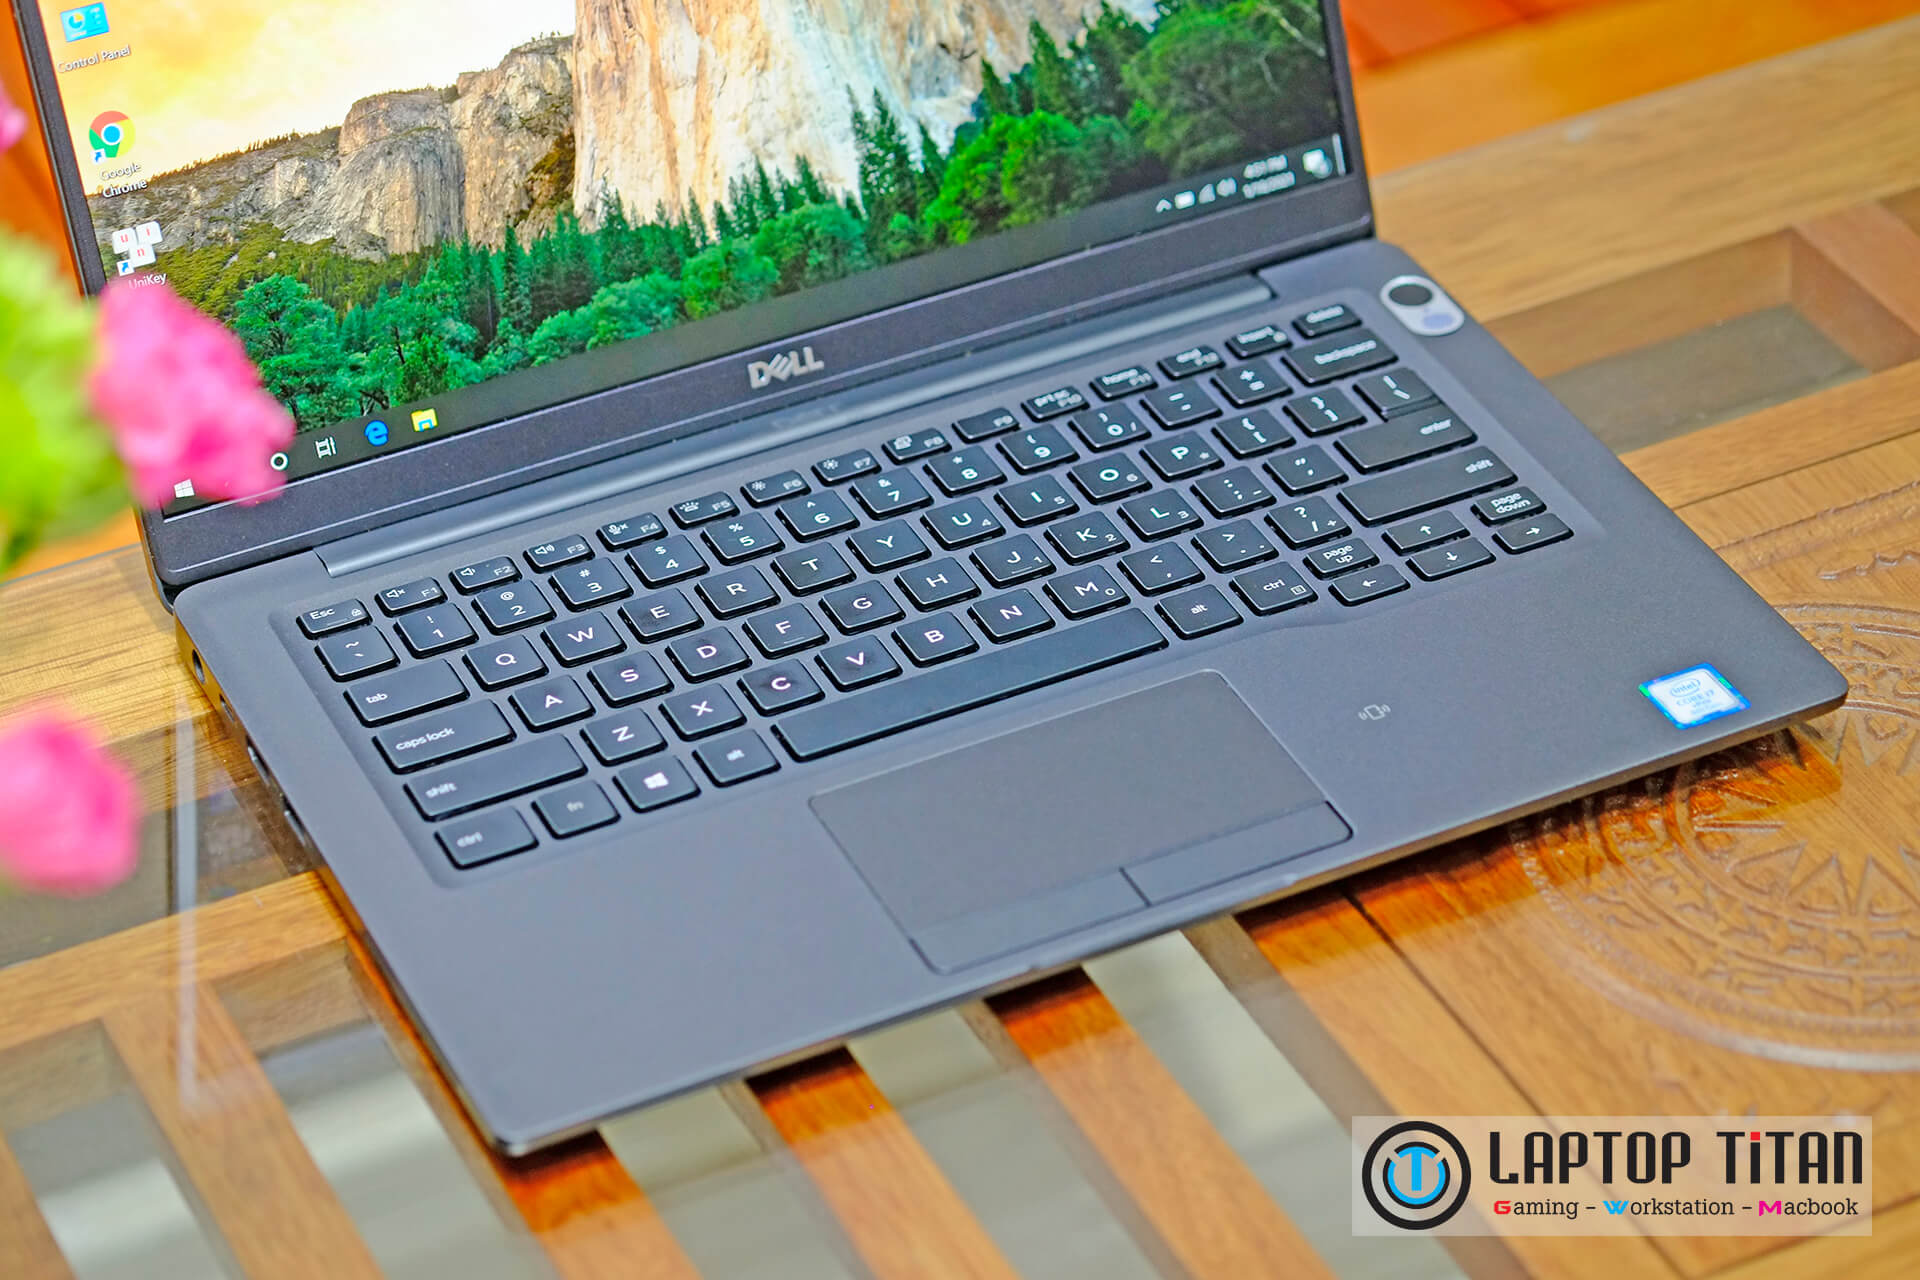 Dell Latitude 7400 laptoptitan 04